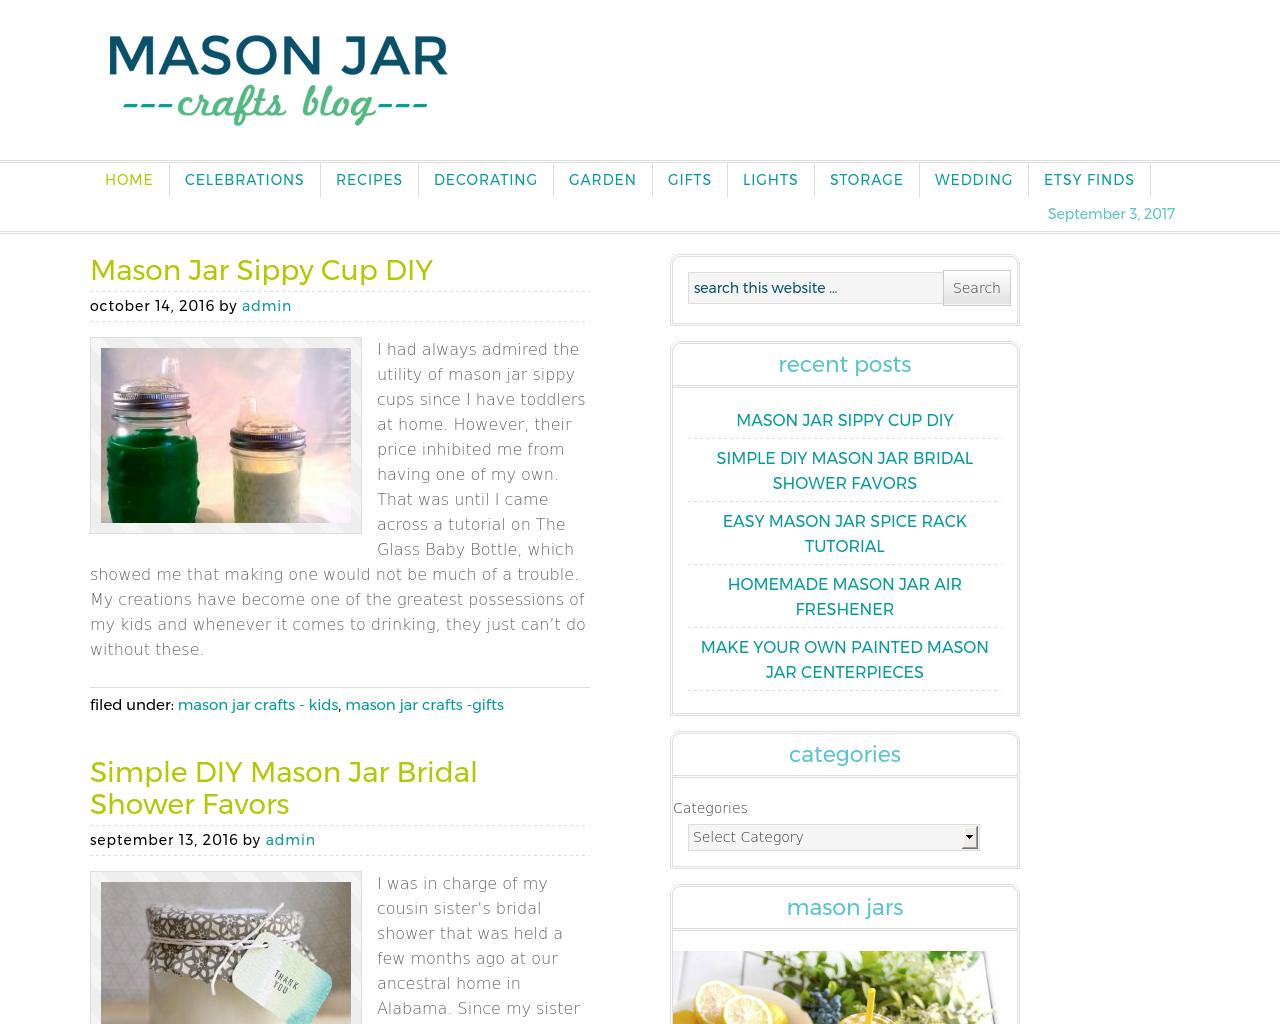 Mason-Jar-Crafts-Advertising-Reviews-Pricing